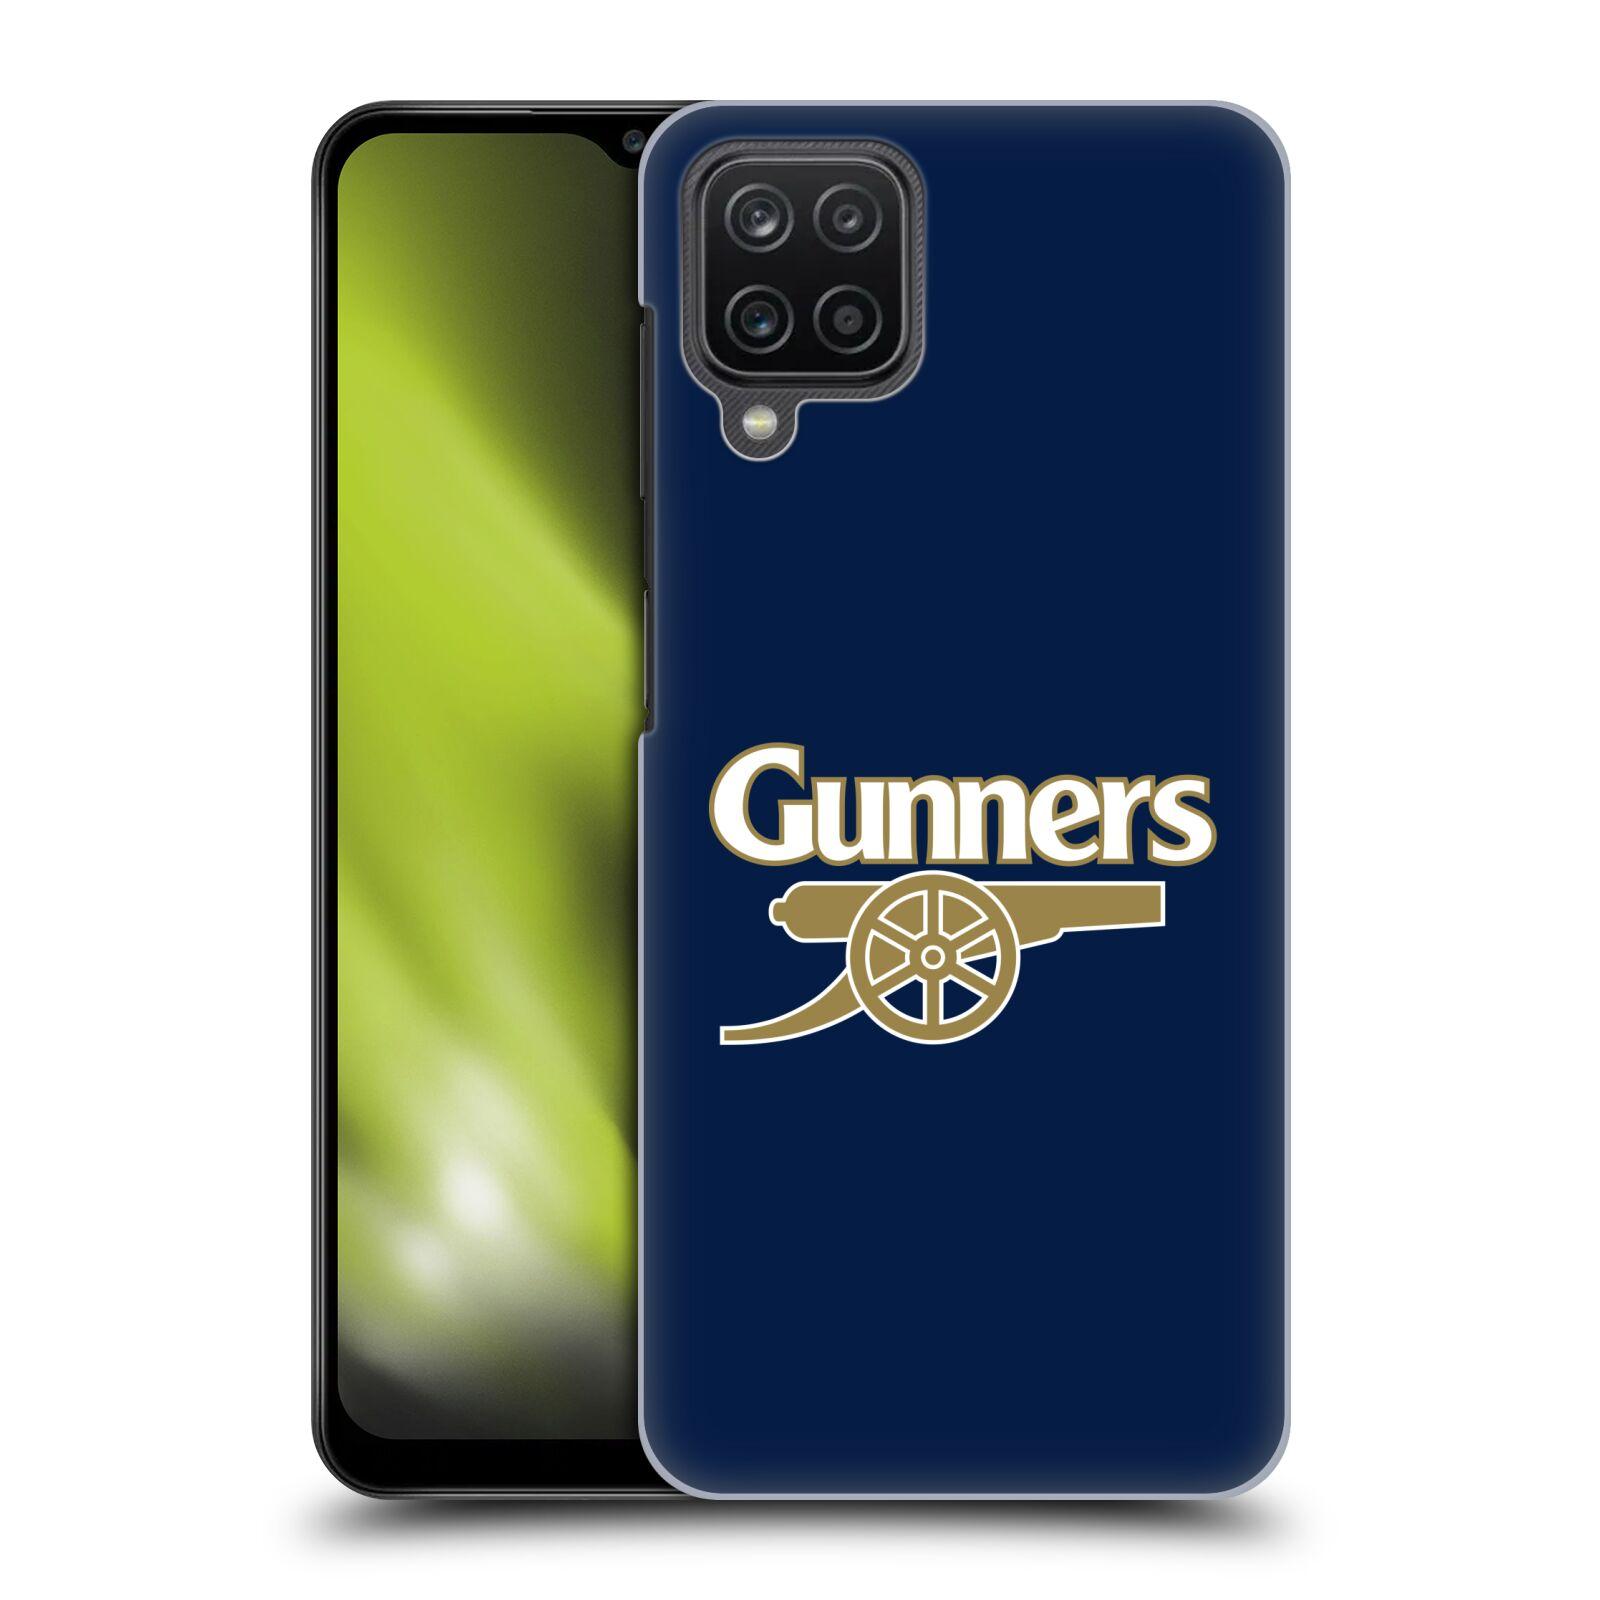 Plastové pouzdro na mobil Samsung Galaxy A12 - Head Case - Arsenal FC - Gunners